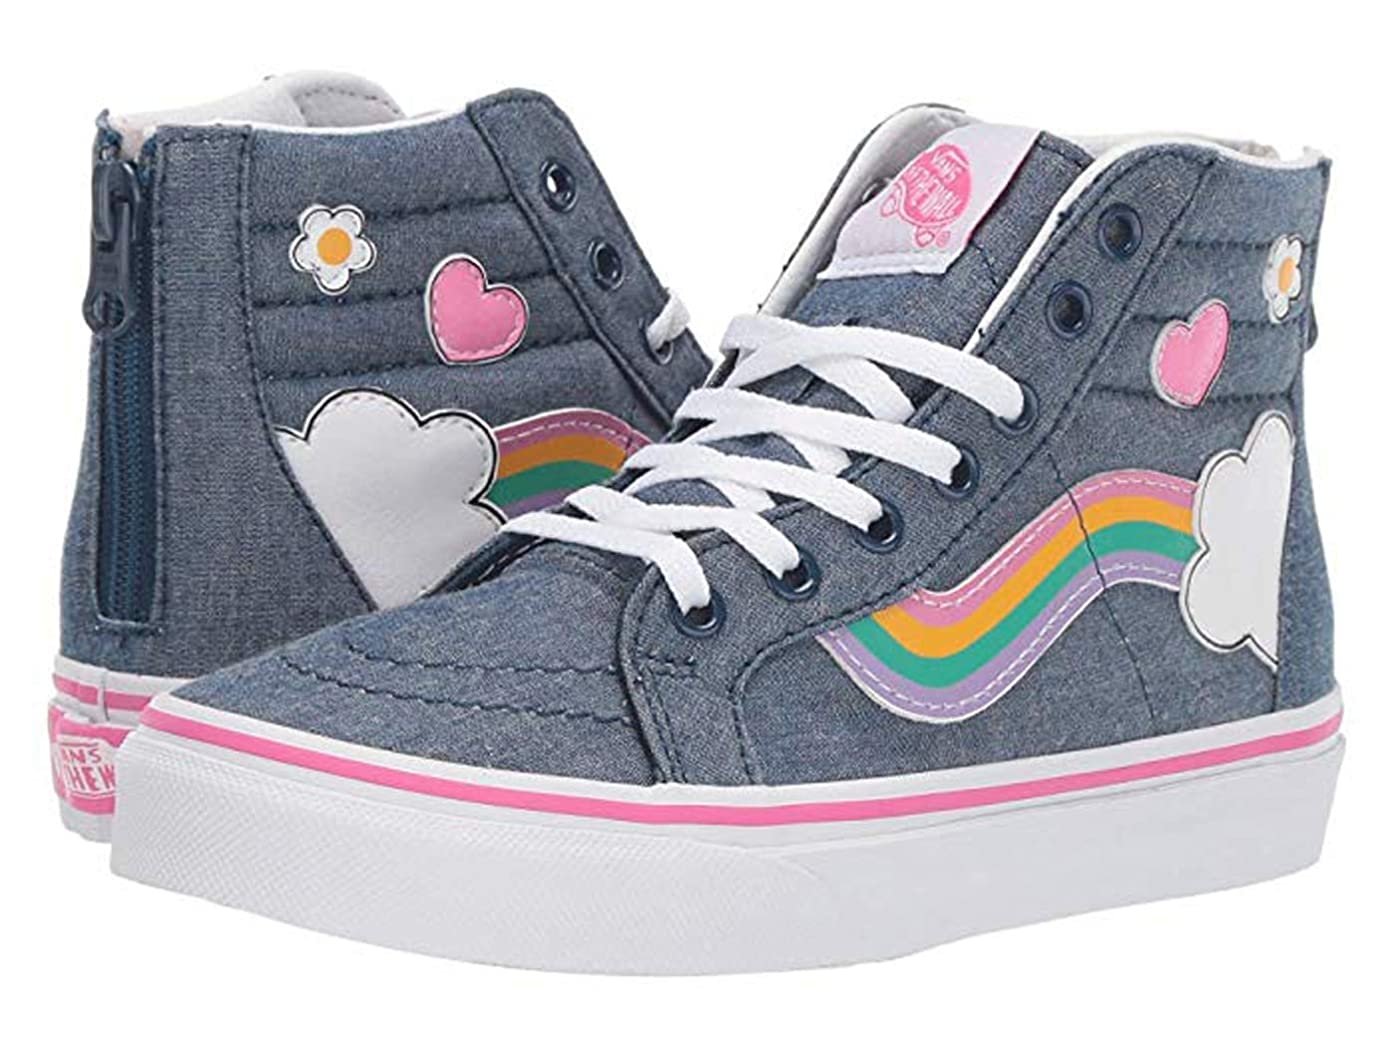 Vans Kids SK8-HI Zip (Rainbow SIDESTRIPE) Denim/White